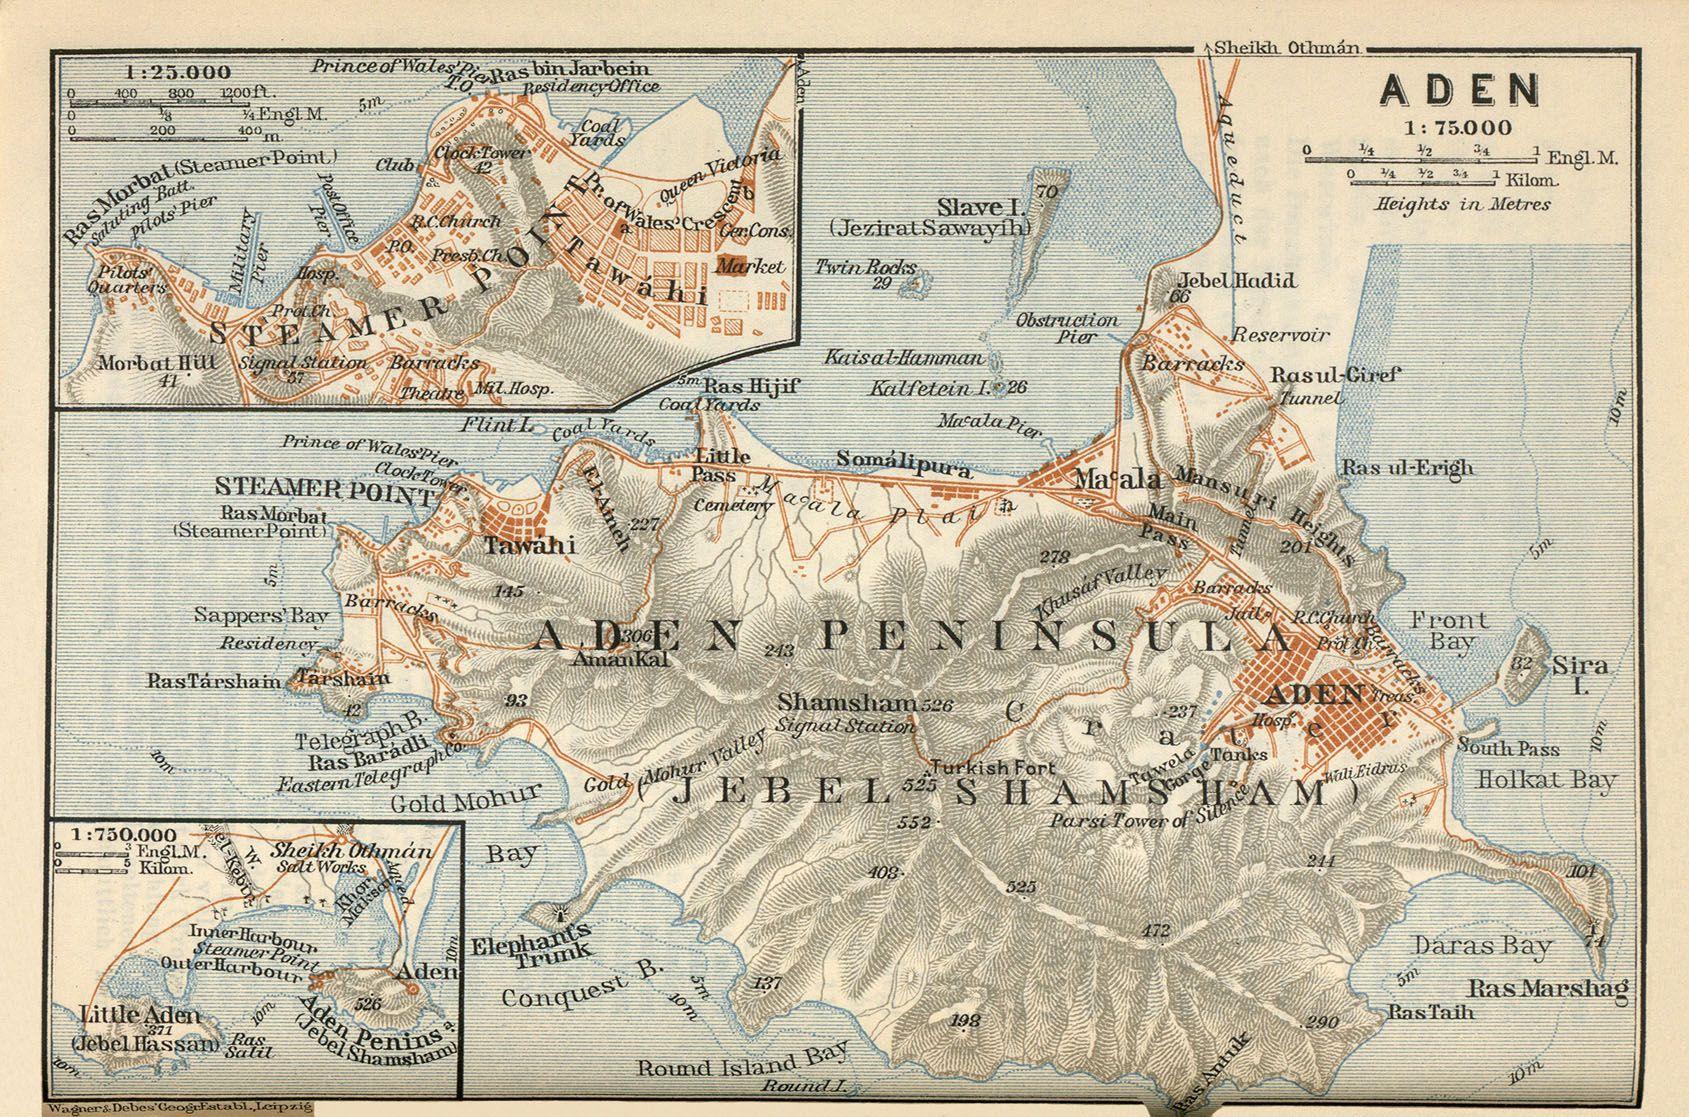 Aden 1914 | Maps | Vintage world maps, Historical maps, Map Map Aden on persian gulf map, taiz map, jaar map, damascus map, abadan map, arabian sea, merca map, middle east map, strait of gibraltar, gulf of oman, kusti map, horn of africa, denim map, tanzania map, ceylon map, gulf of aqaba, dubai map, cairo map, karamay map, bay of bengal, sinai peninsula map, piracy in the strait of malacca, red sea, pegu map, medina map, dead sea map, al hofuf map, piracy in somalia, indus river map,